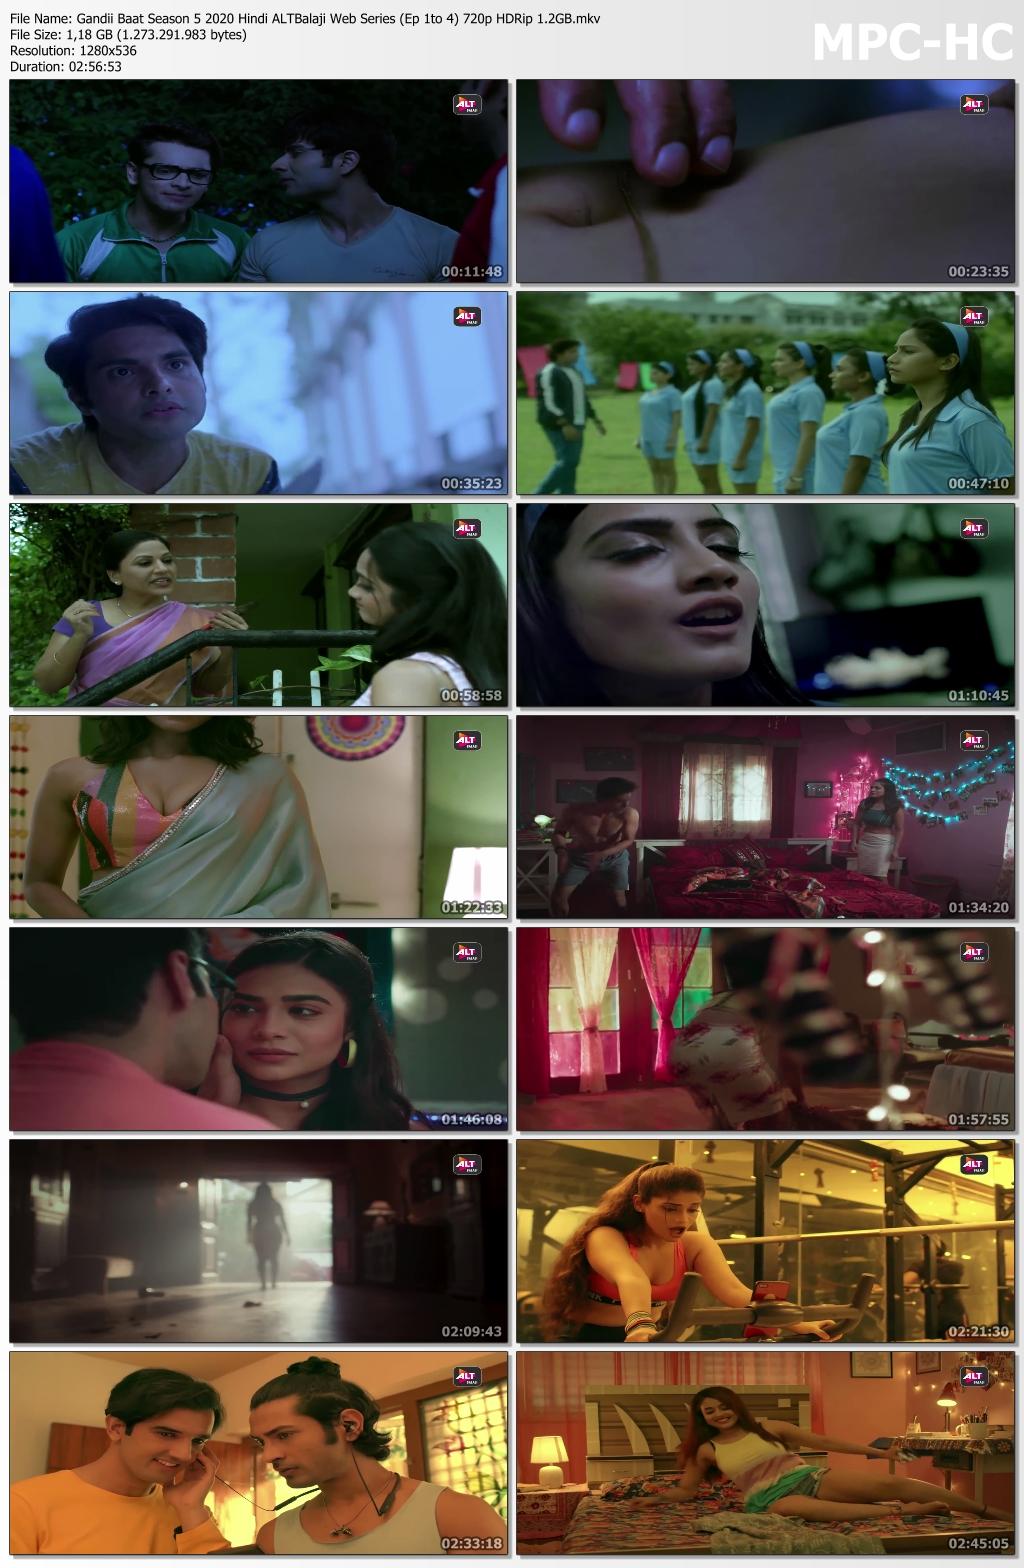 Gandii-Baat-Season-5-2020-Hindi-ALTBalaji-Web-Series-Ep-1to-4-720p-HDRip-1-2-GB-mkv-thumbs